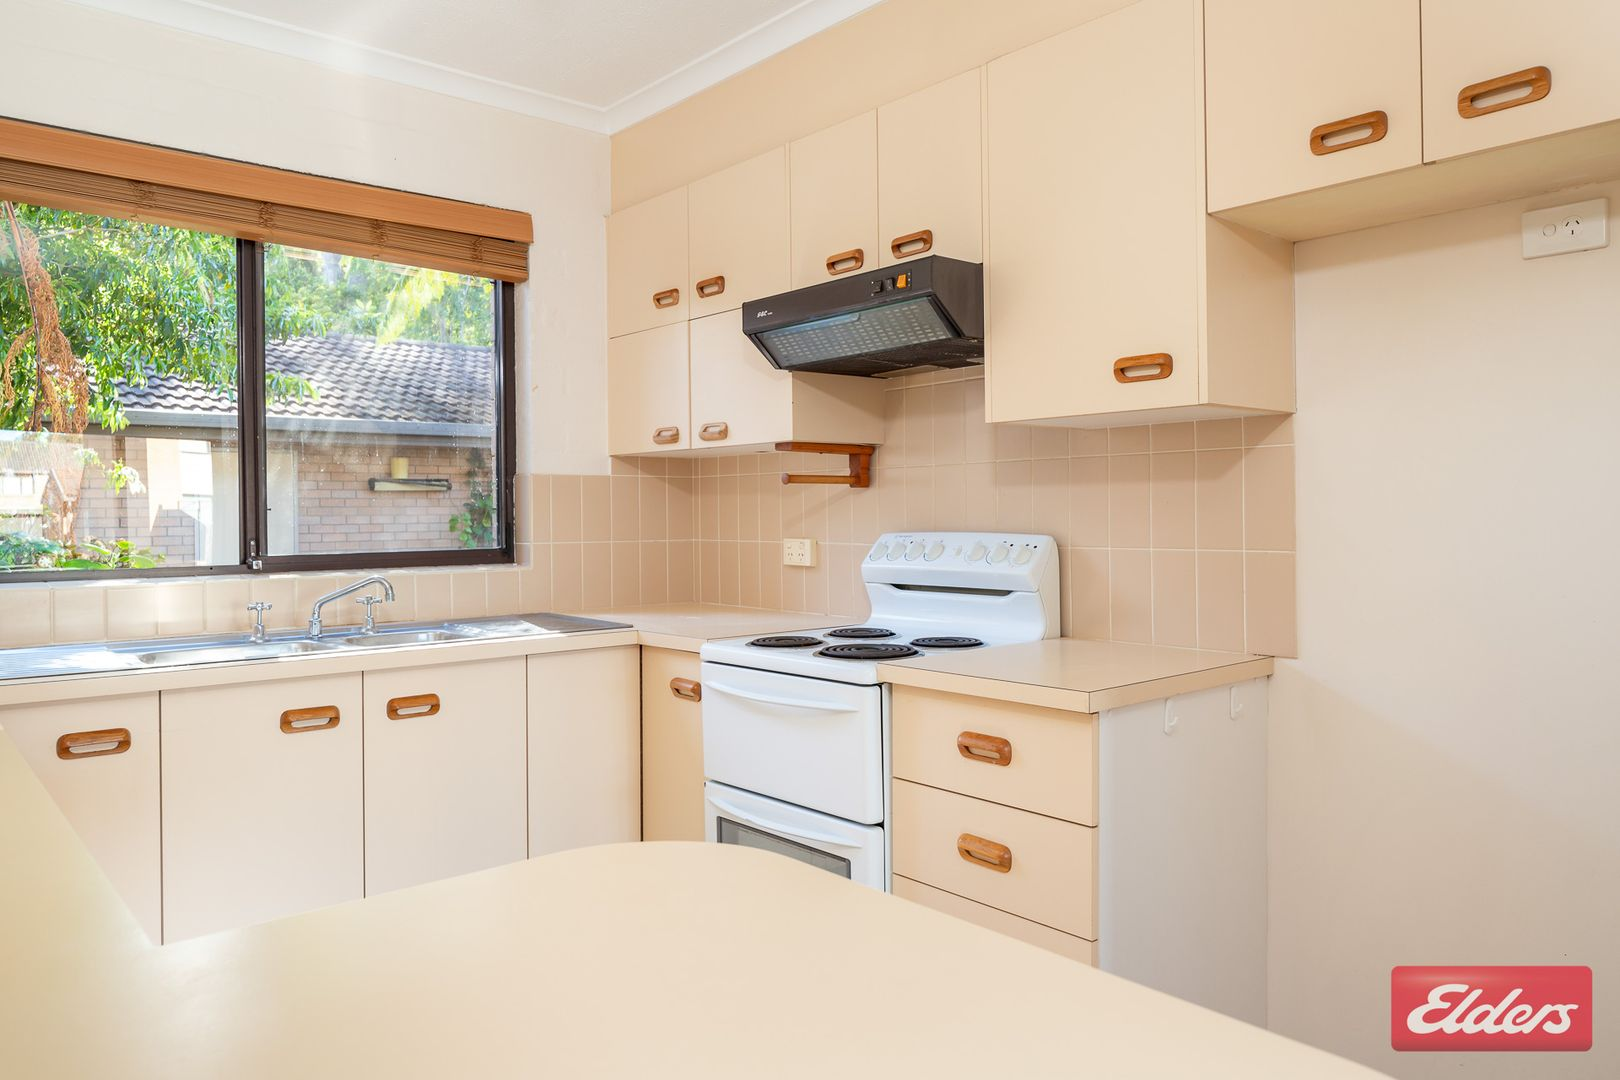 34/1-9 Wharf Road, North Batemans Bay NSW 2536, Image 2